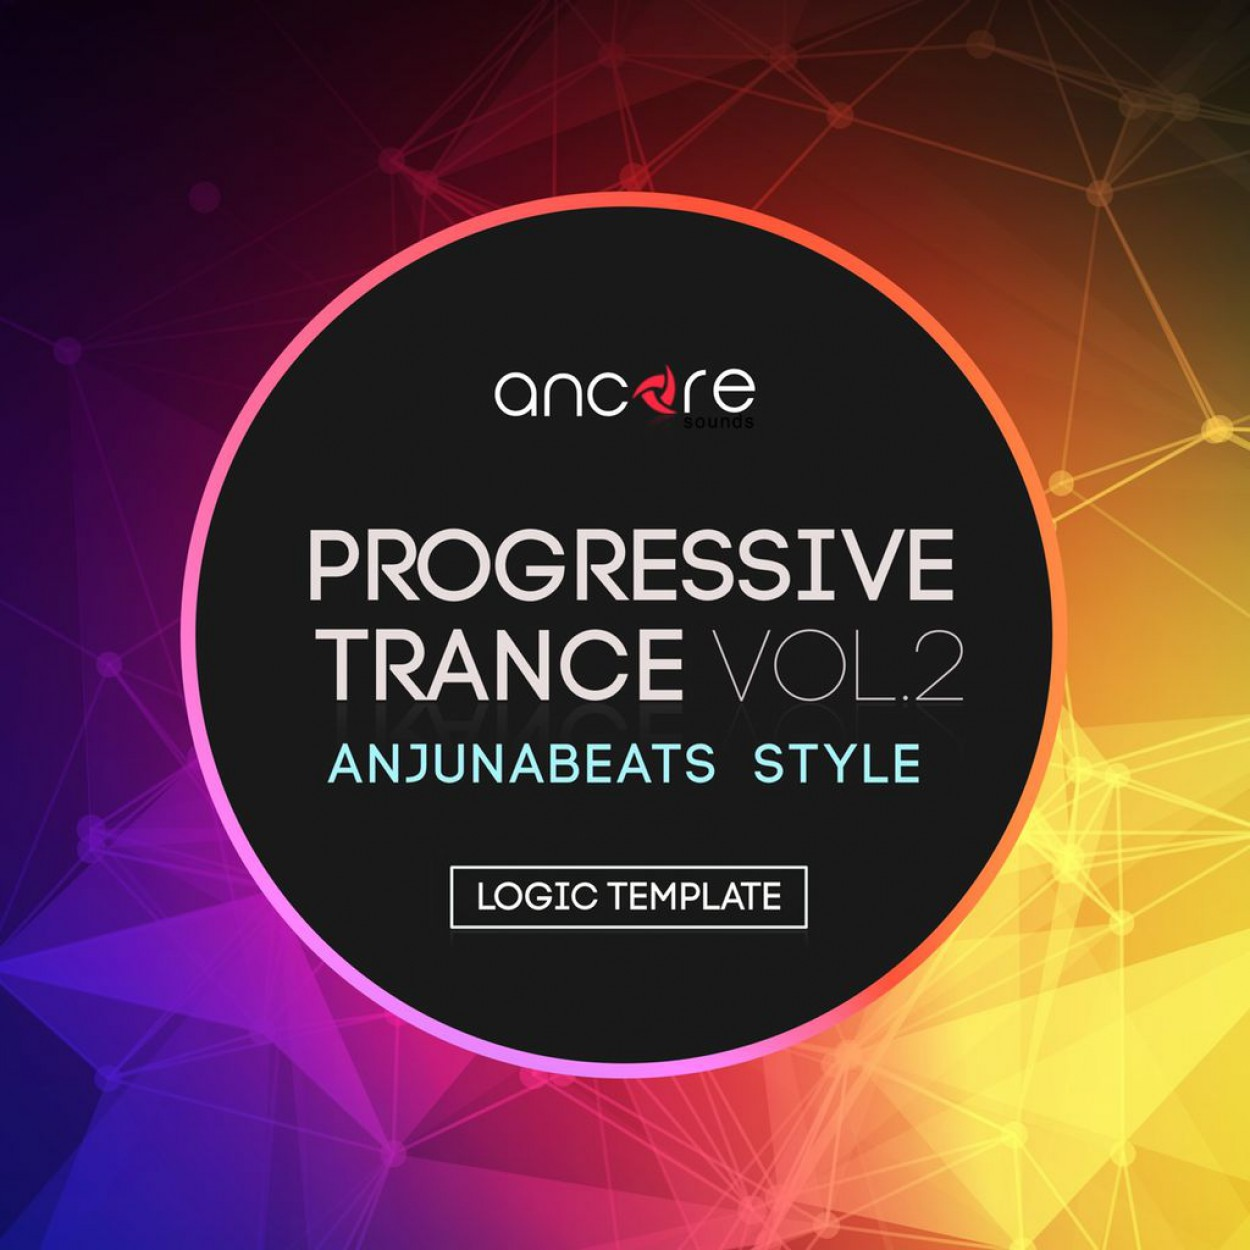 Progressive Trance 2.0 Logic Pro Template (Anlunabeats Style) Vol.2